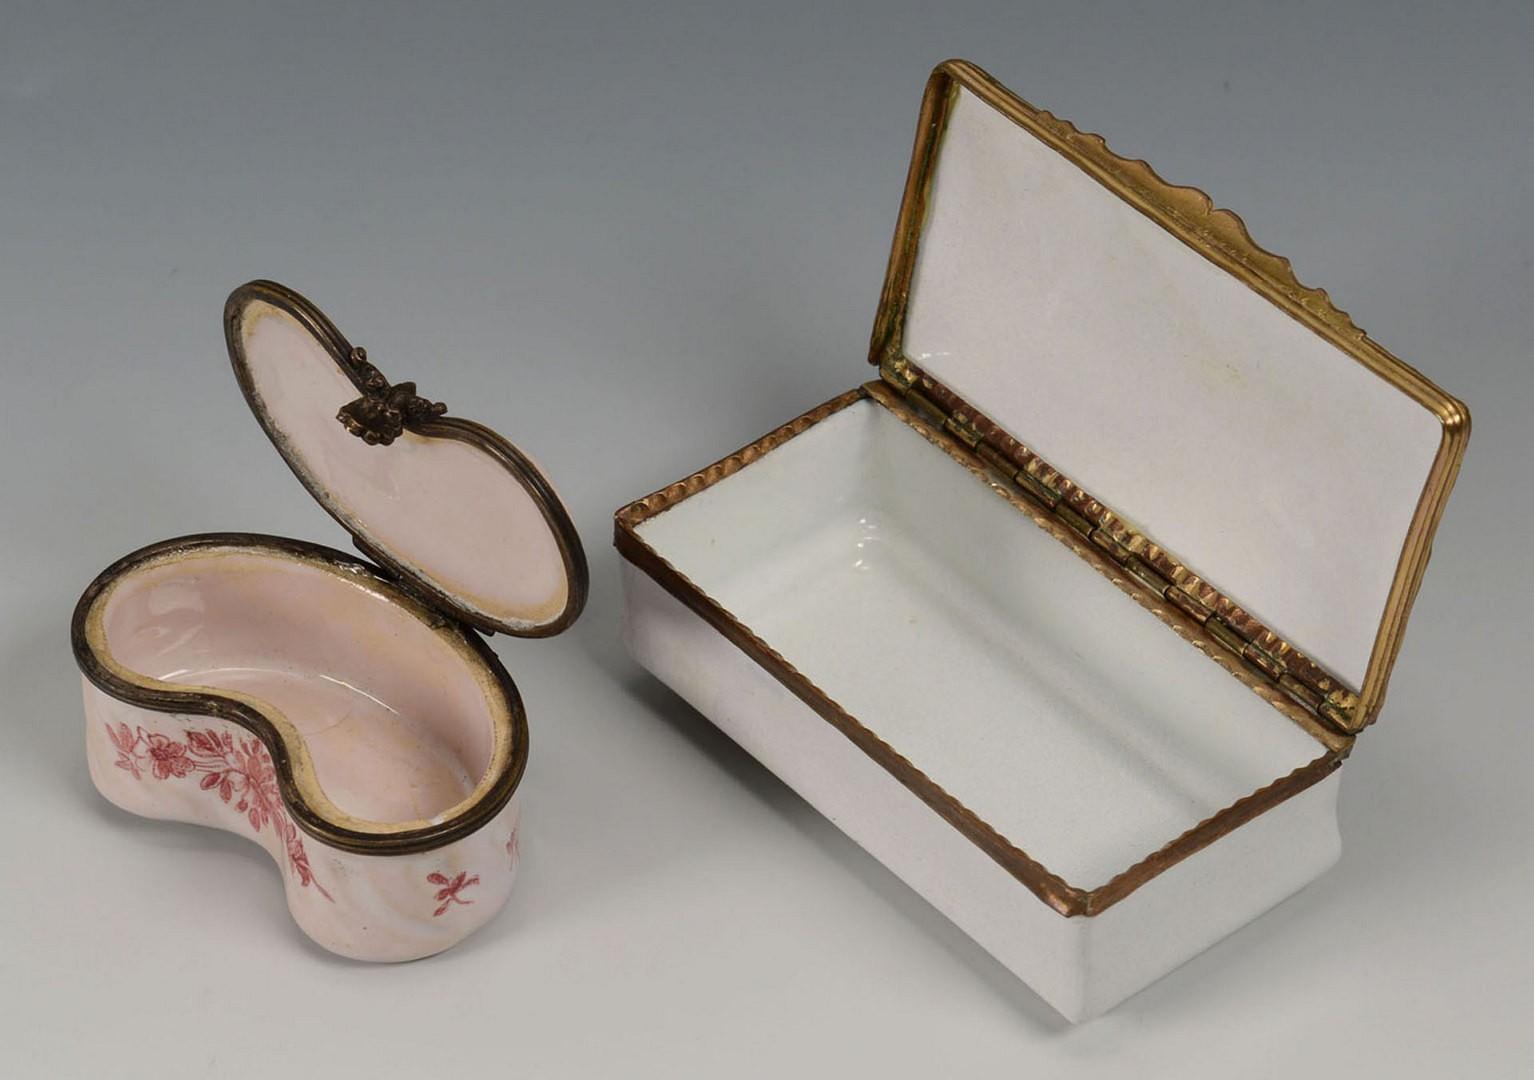 Lot 3594265: 2 19th century enamel boxes inc. Veuve Perrin